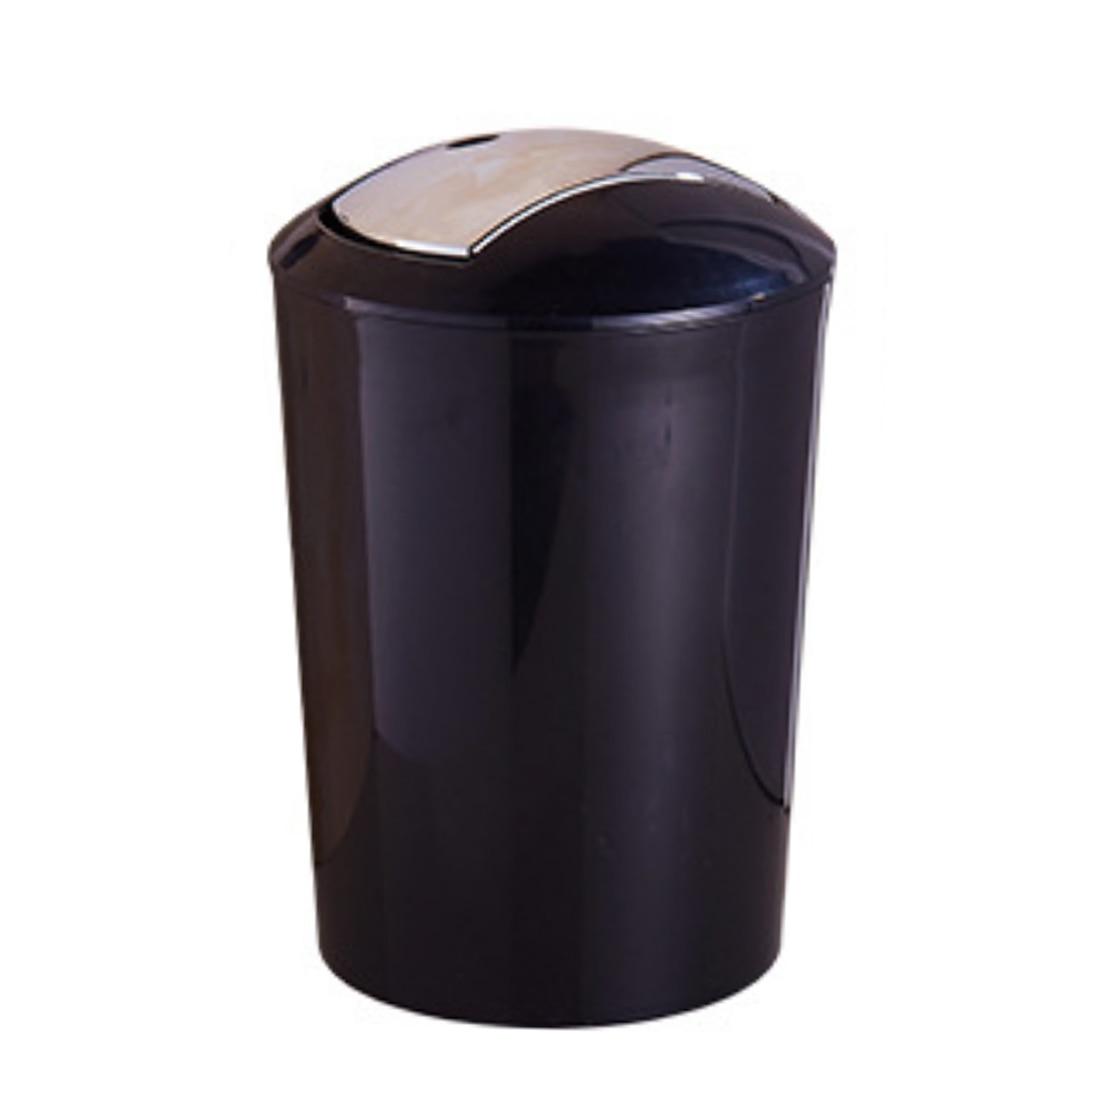 New Hot 10L European Brief Style Garbage Press Type Can Plastic Trash Waste Storage Bin with Lid Garbage Dark Black L